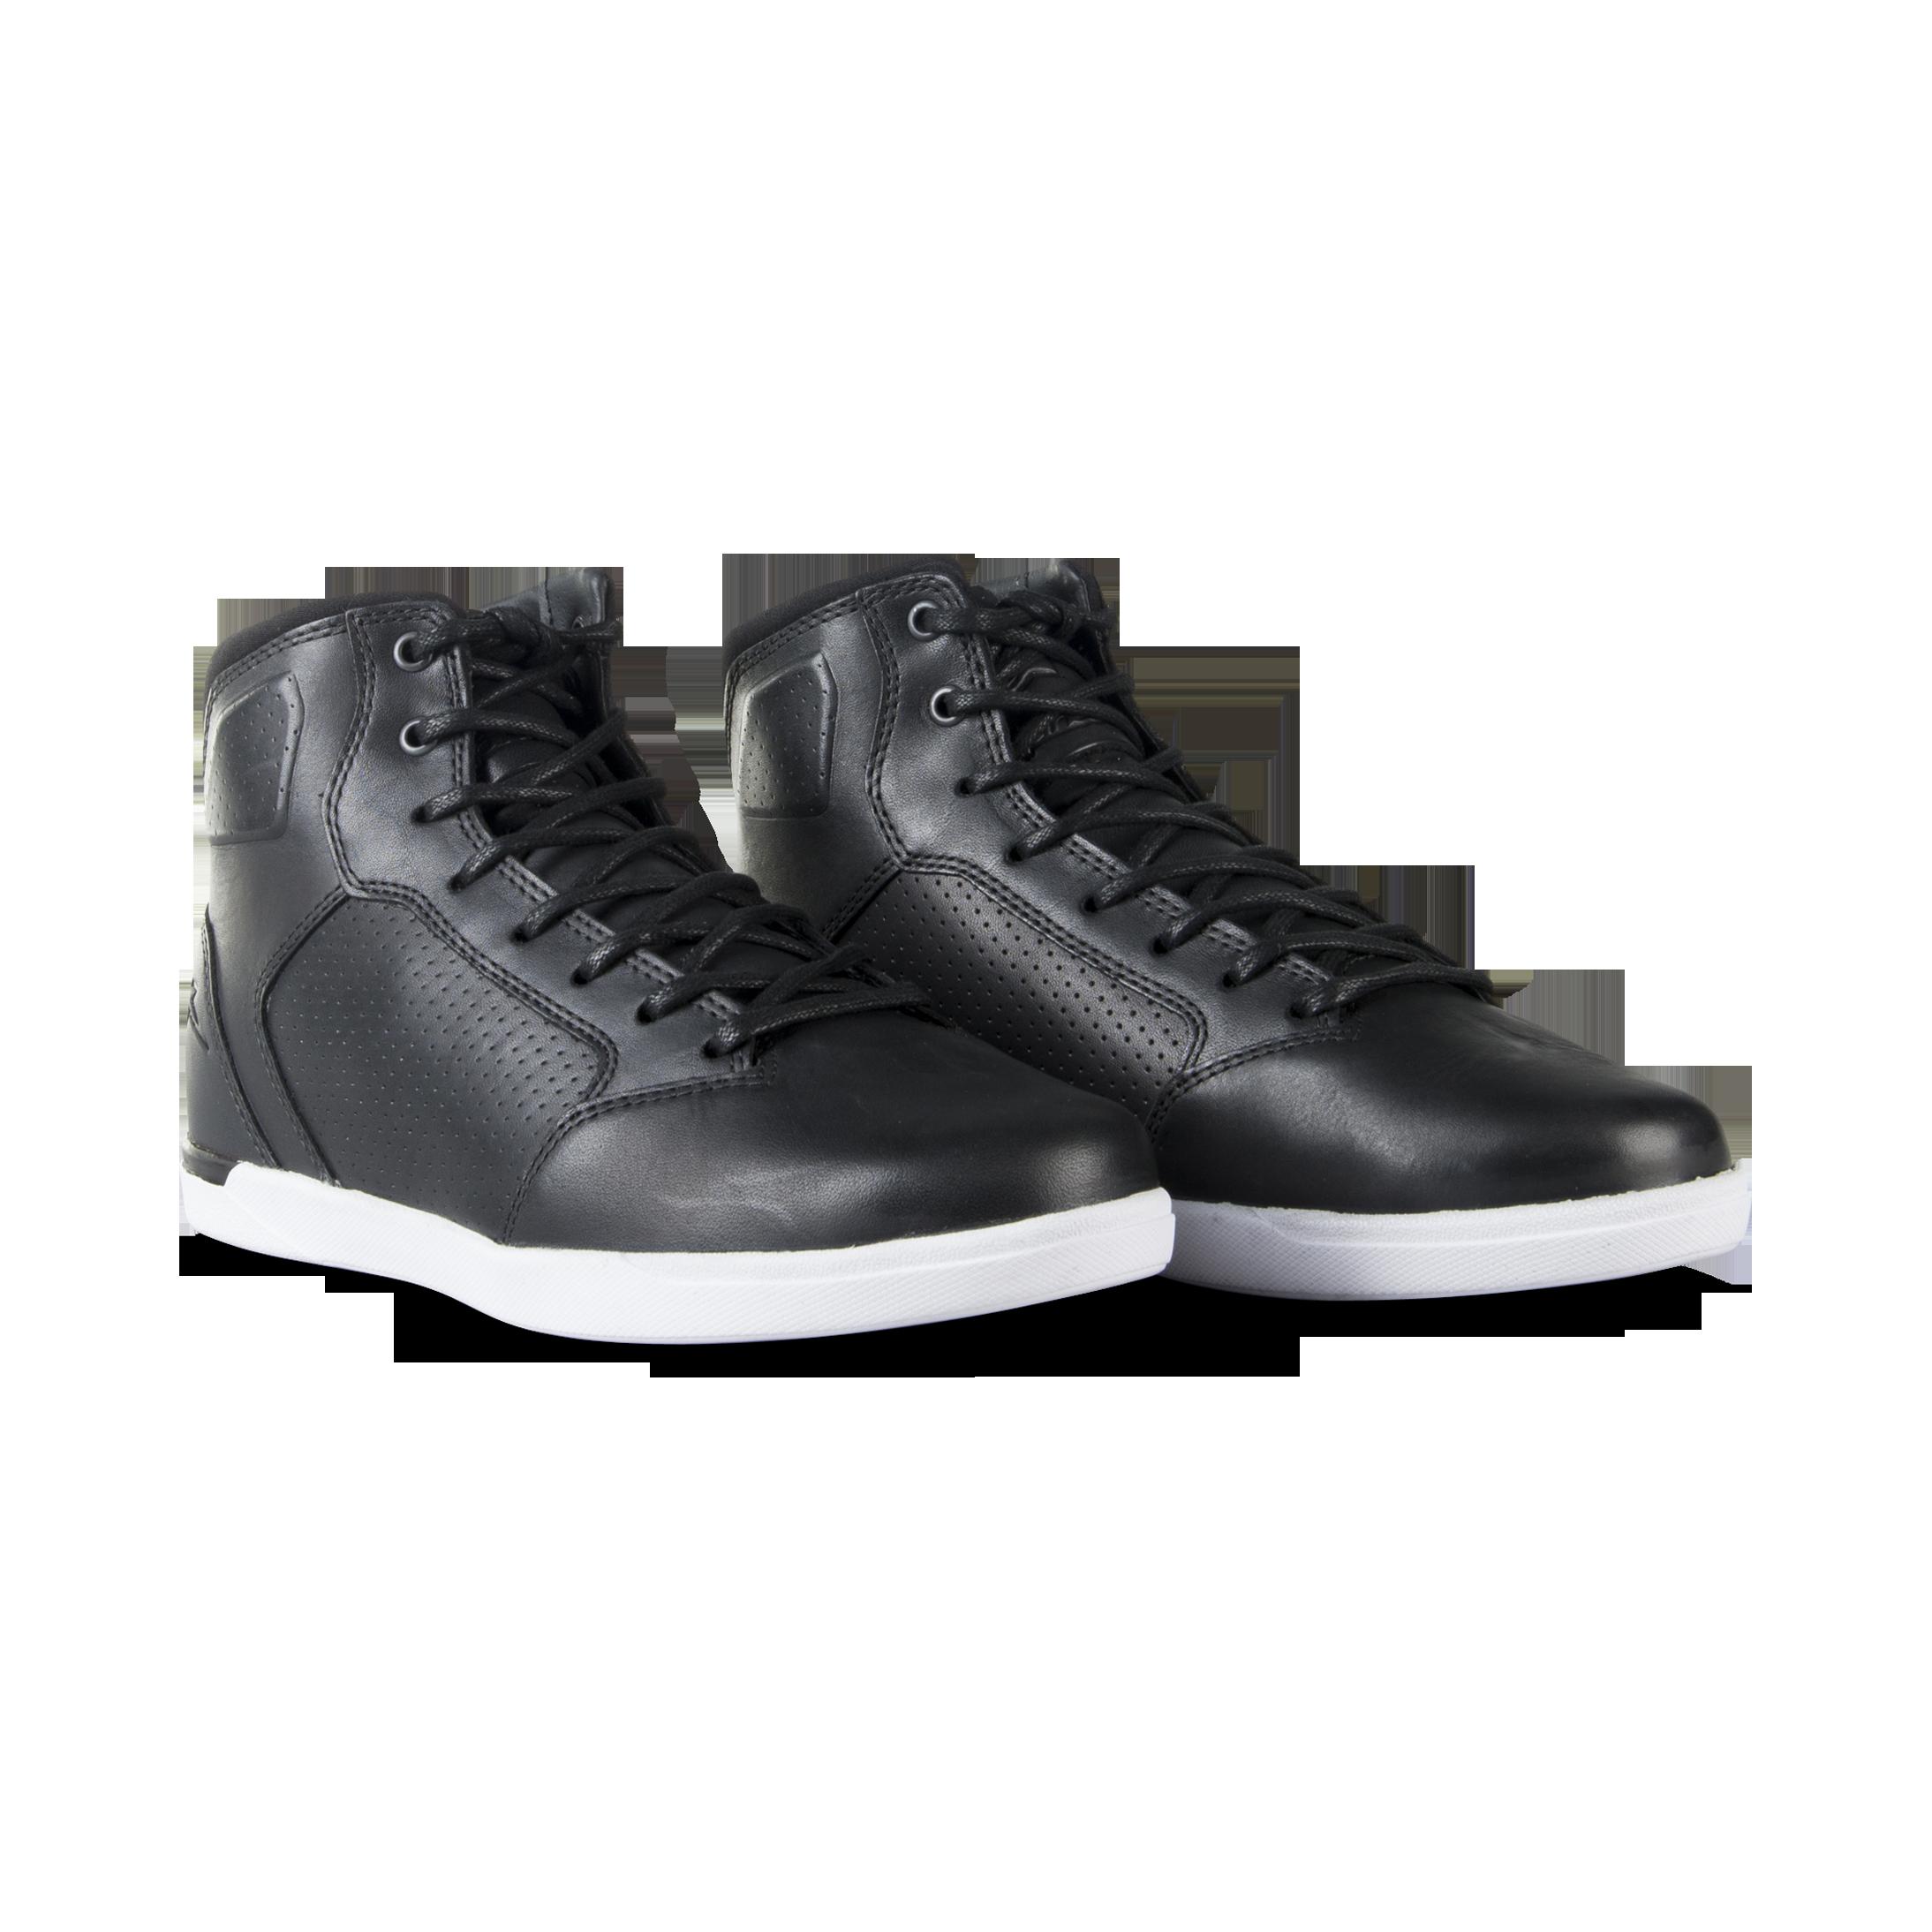 Alpinestars J-Cult Shoe 10.5, Black